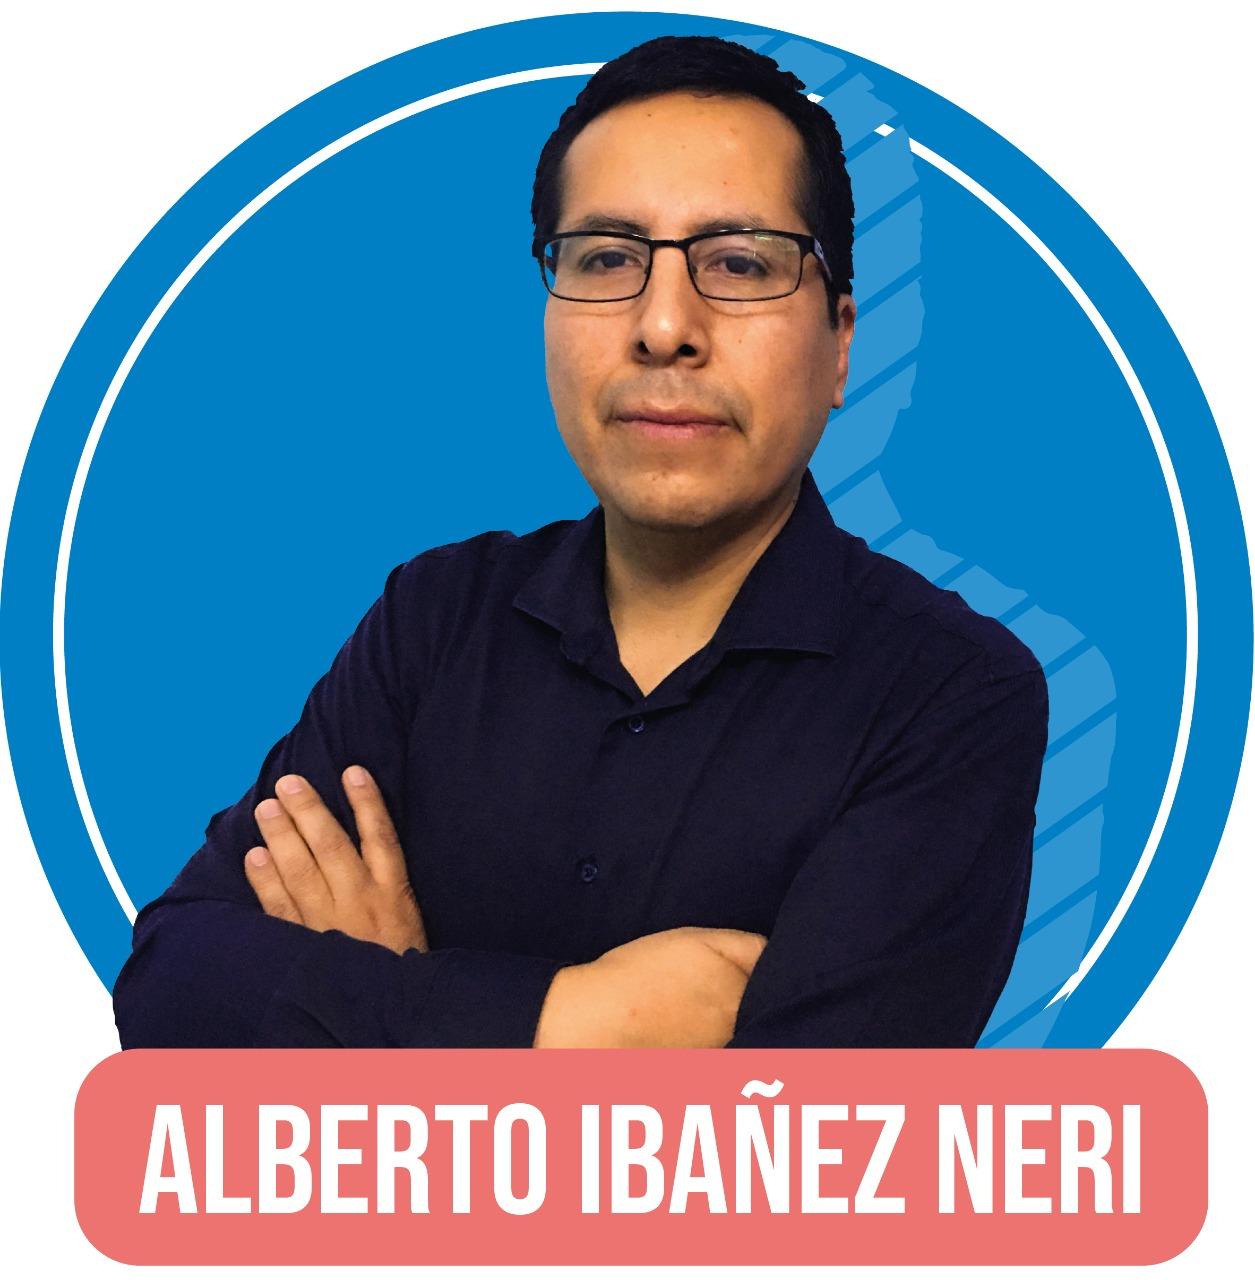 Alberto Ibañez, Alberto Neri